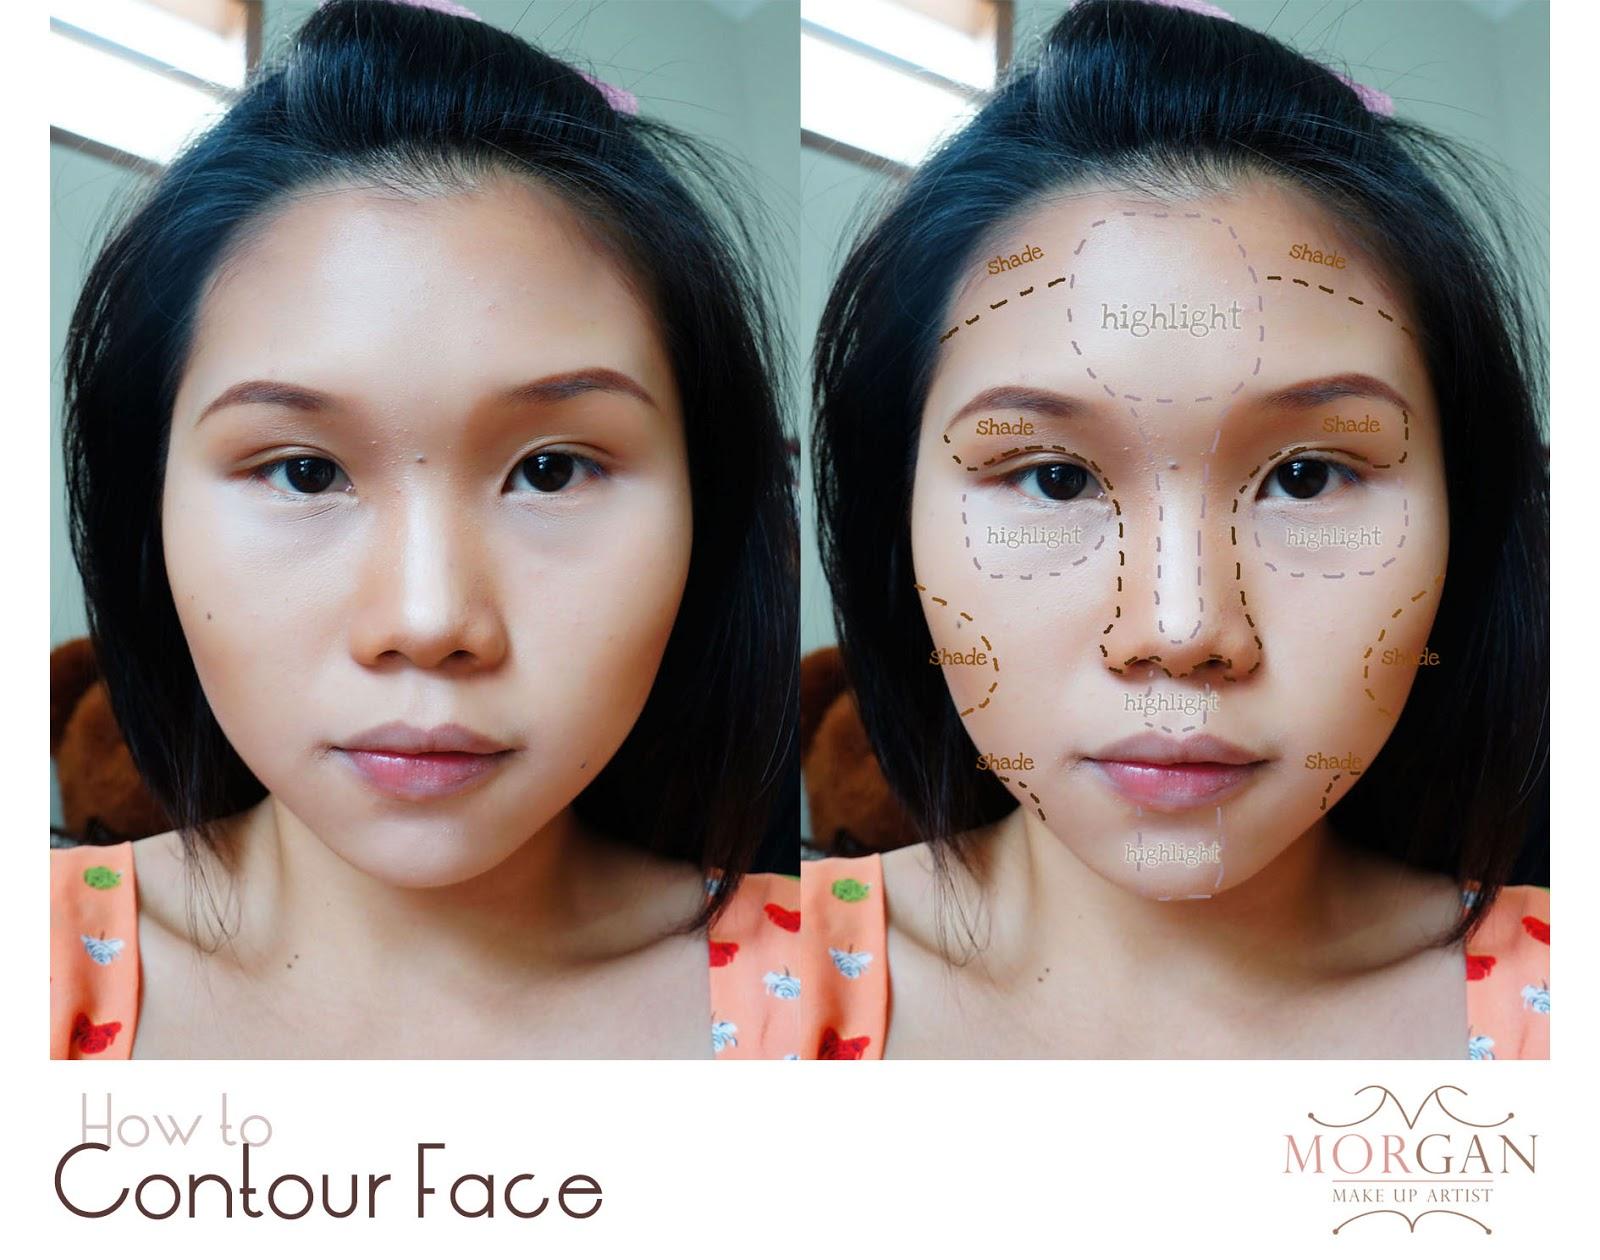 morgan make up artist: how to make up like the singapore